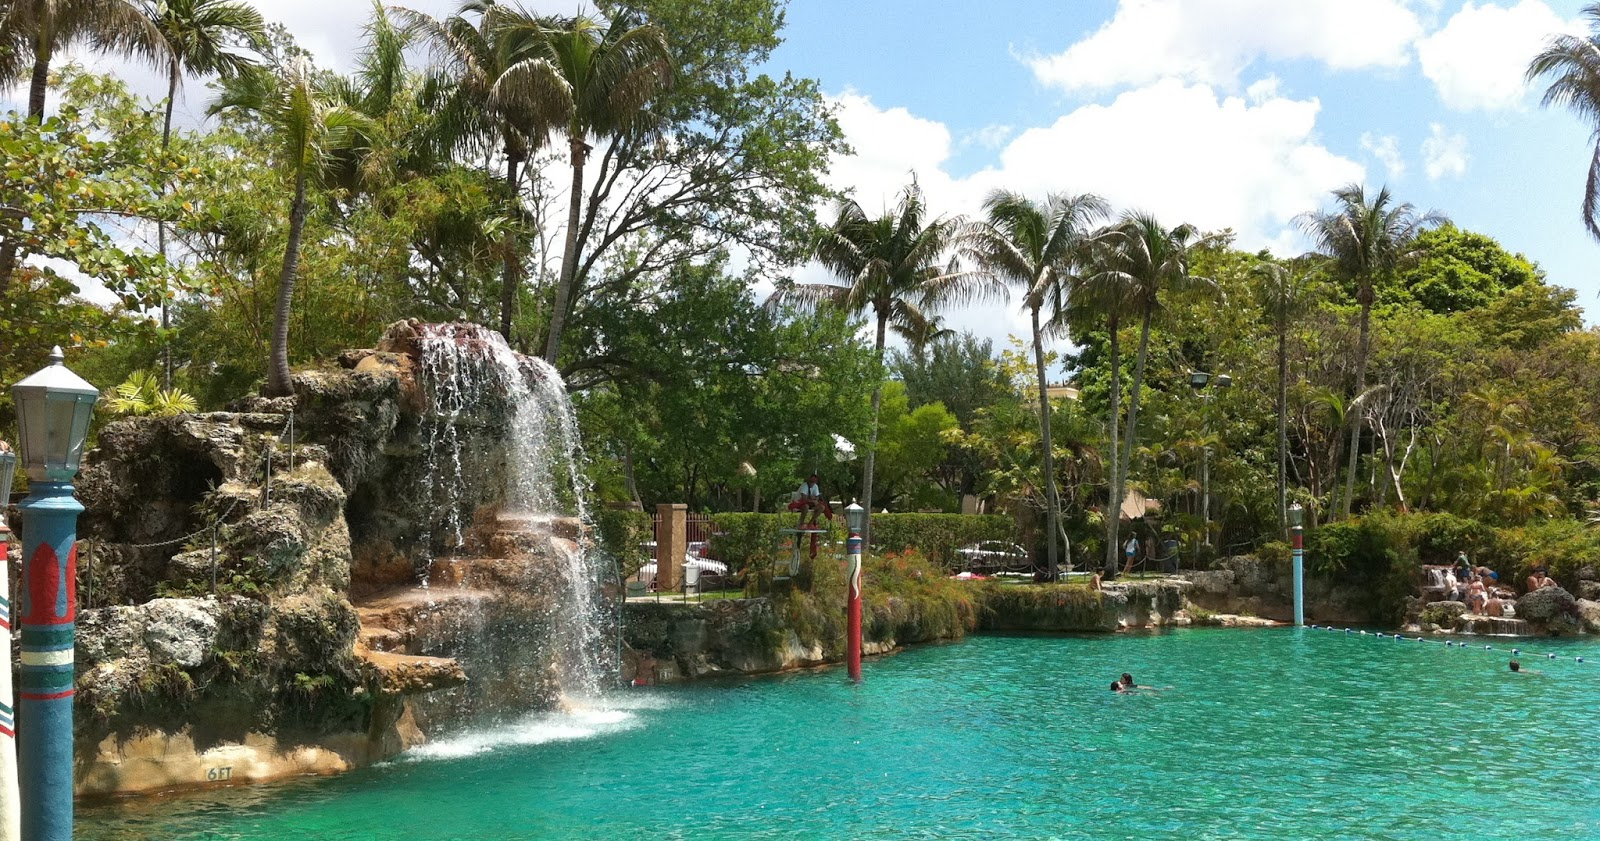 venetian pool in miami the biggest artificial pool in florida tips trip florida